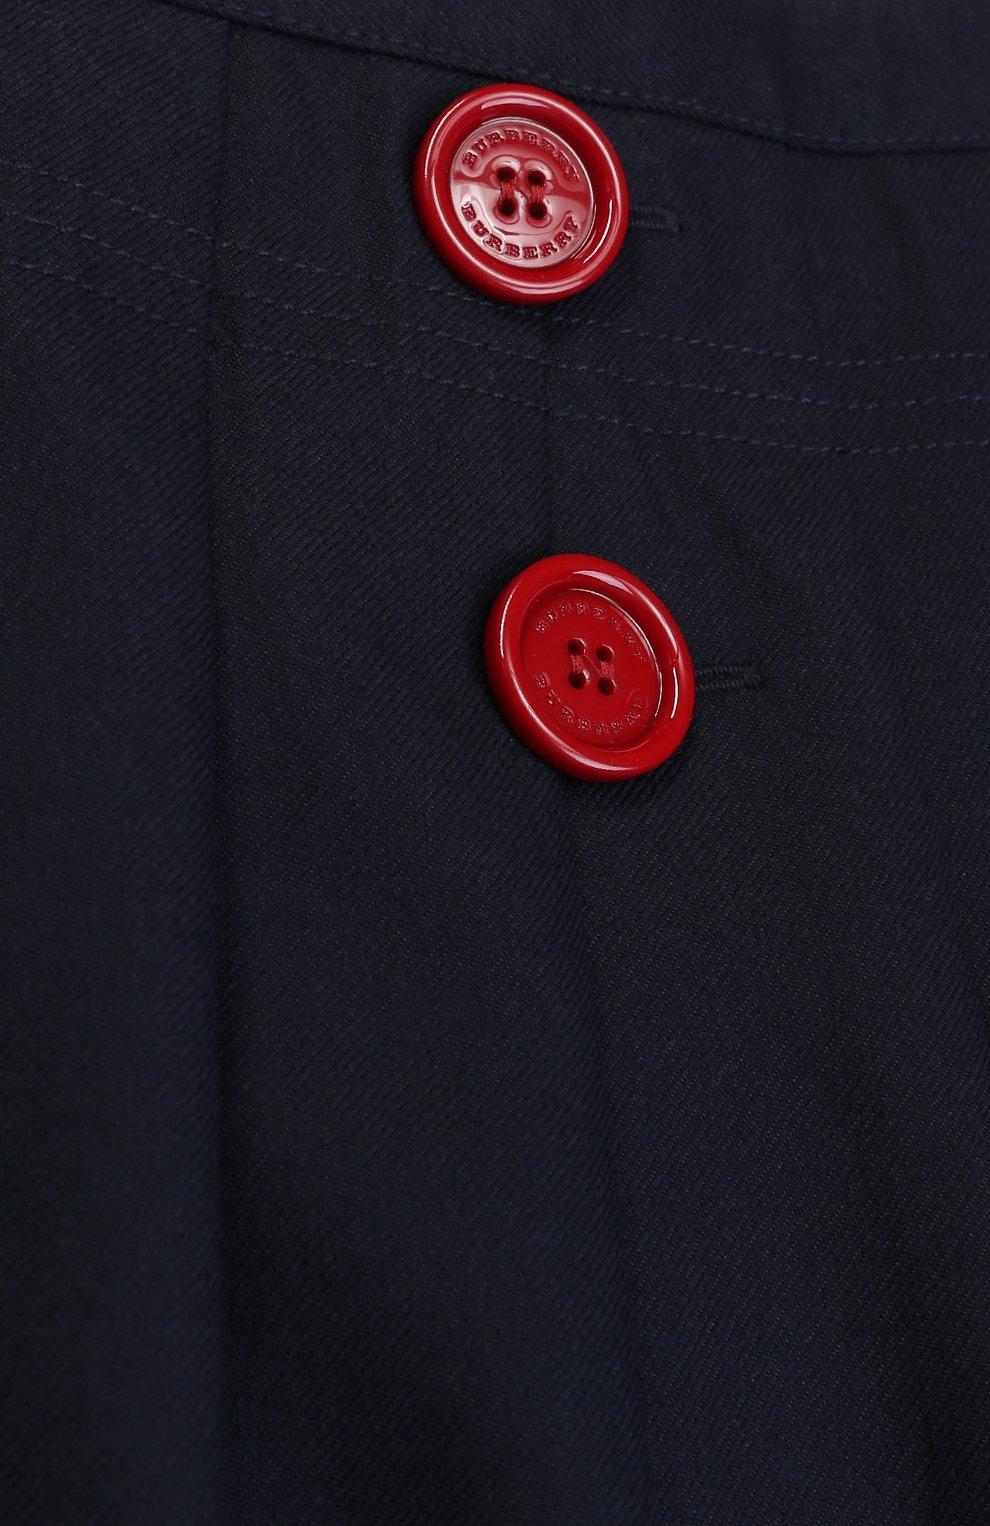 Юбка из шерсти со складками и декоративными пуговицами   Фото №3